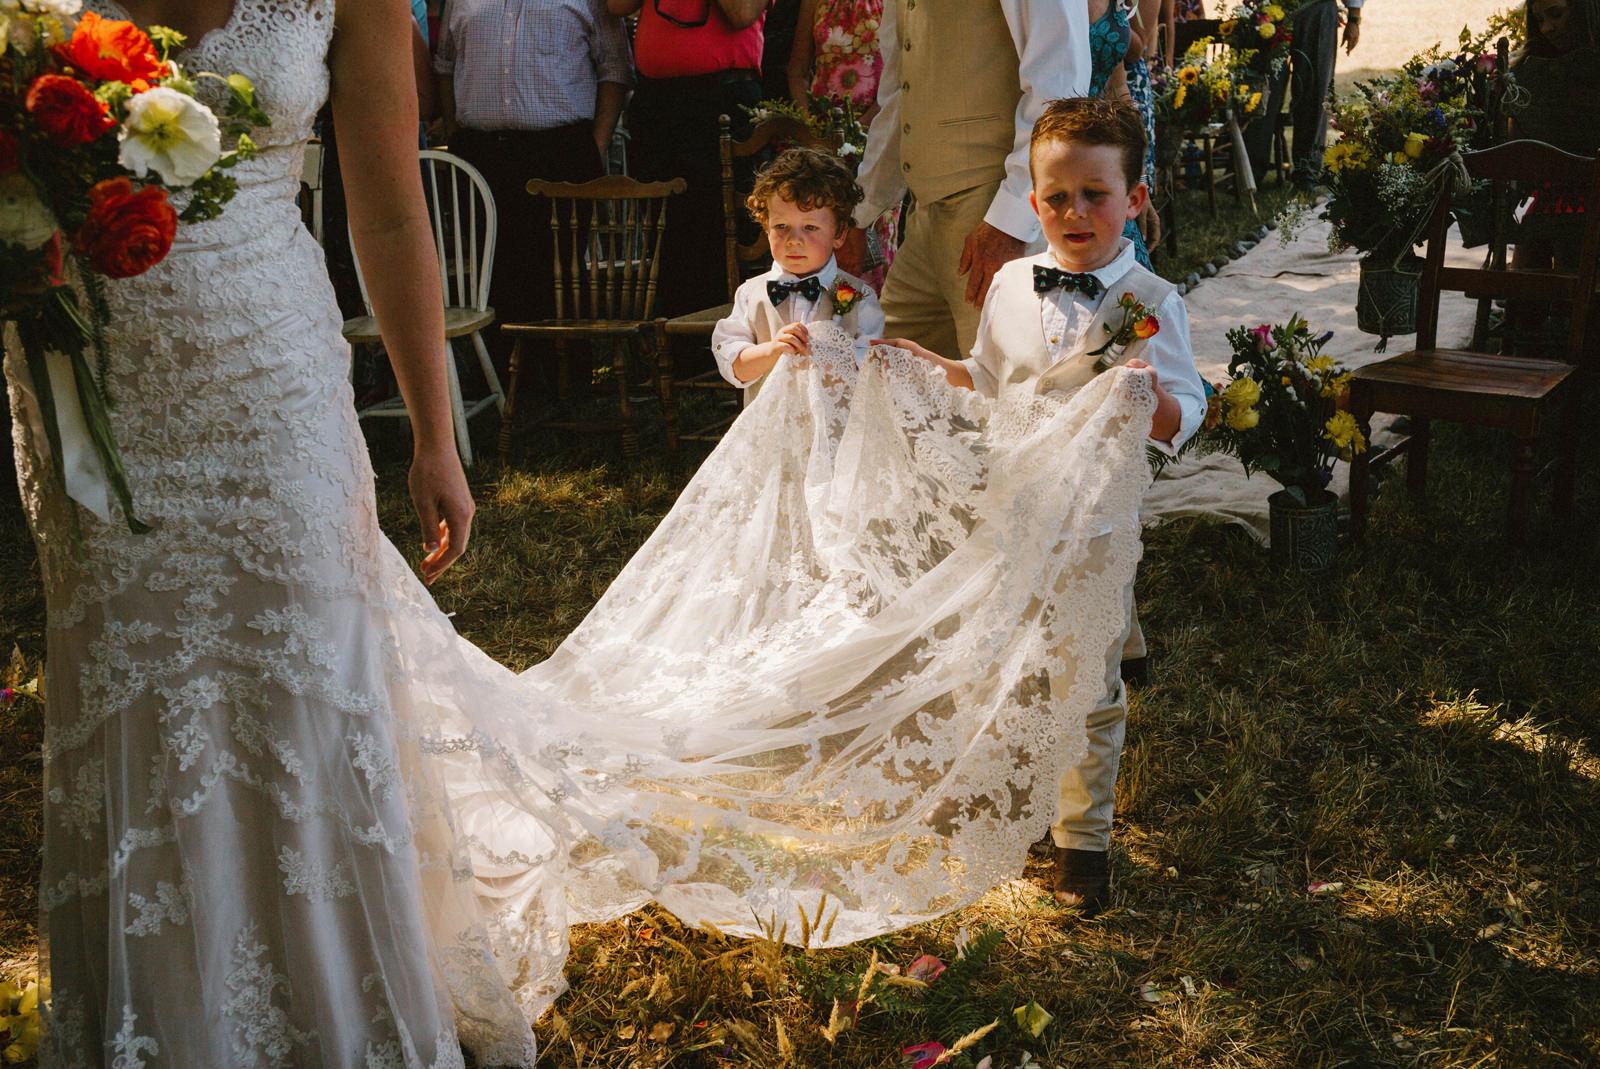 rivers-bend-retreat-wedding-021 RIVER'S BEND RETREAT WEDDING